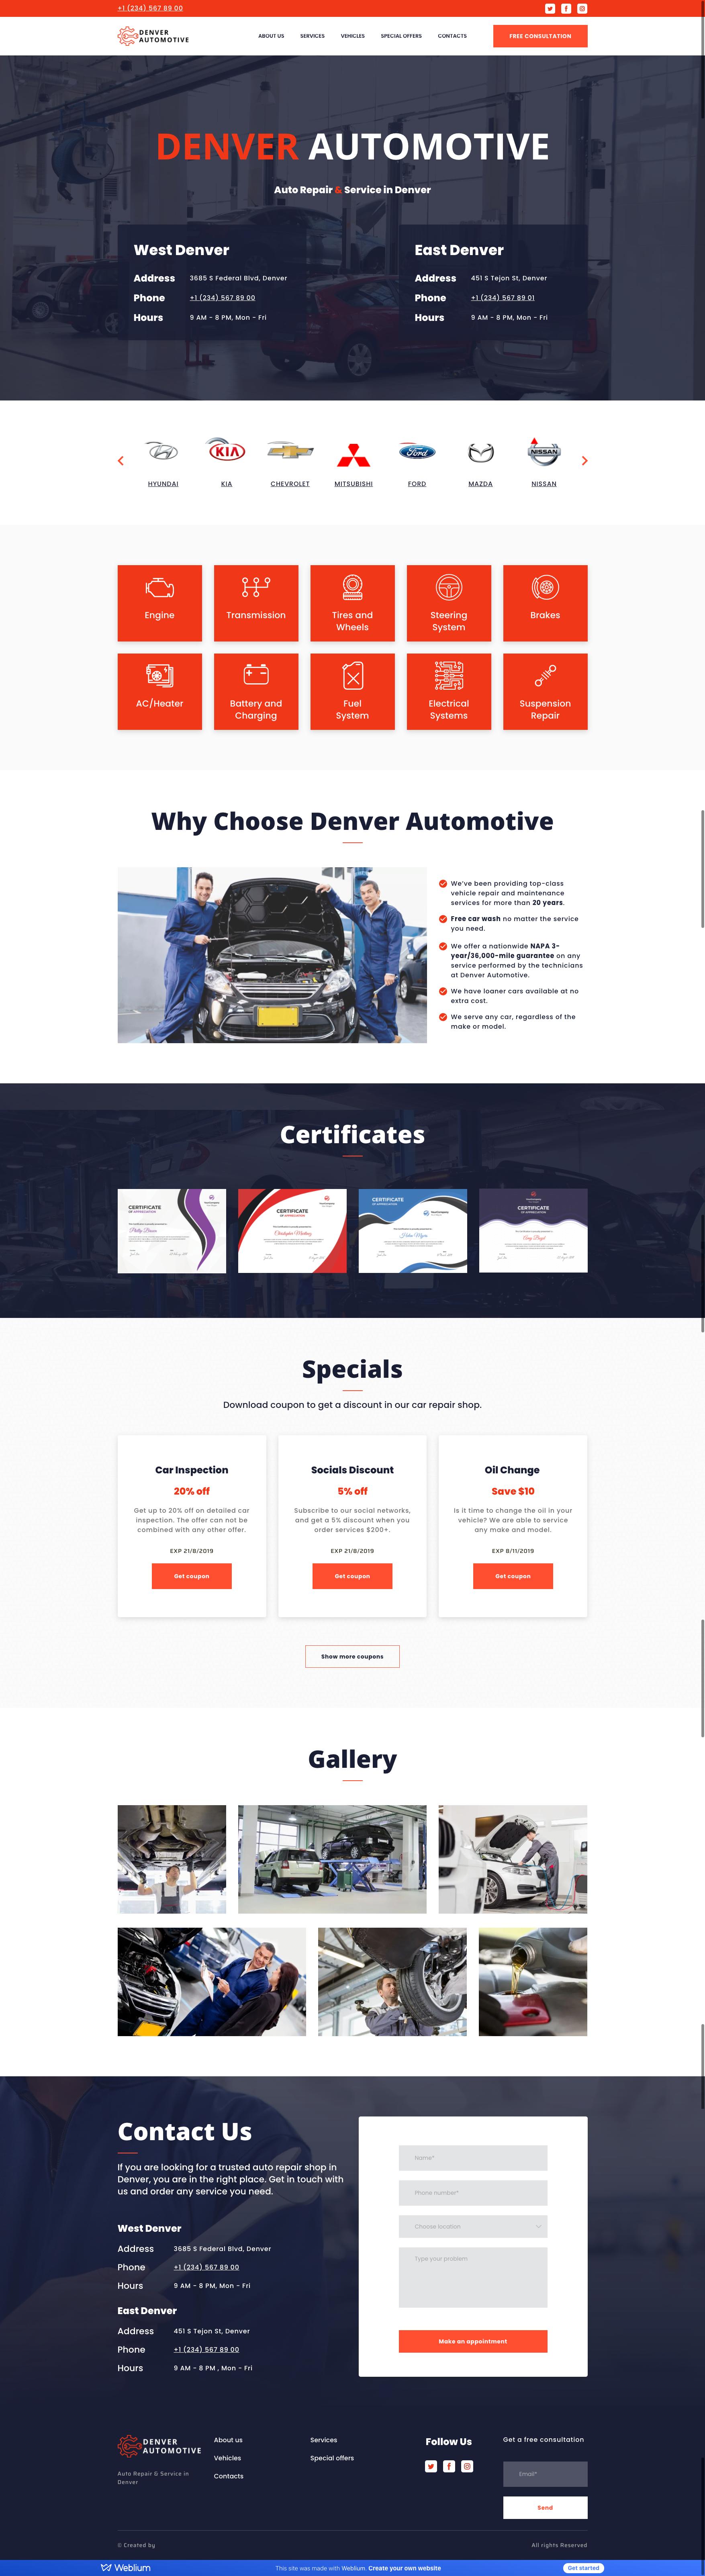 2021-06-03-16-07-automotive.weblium.site